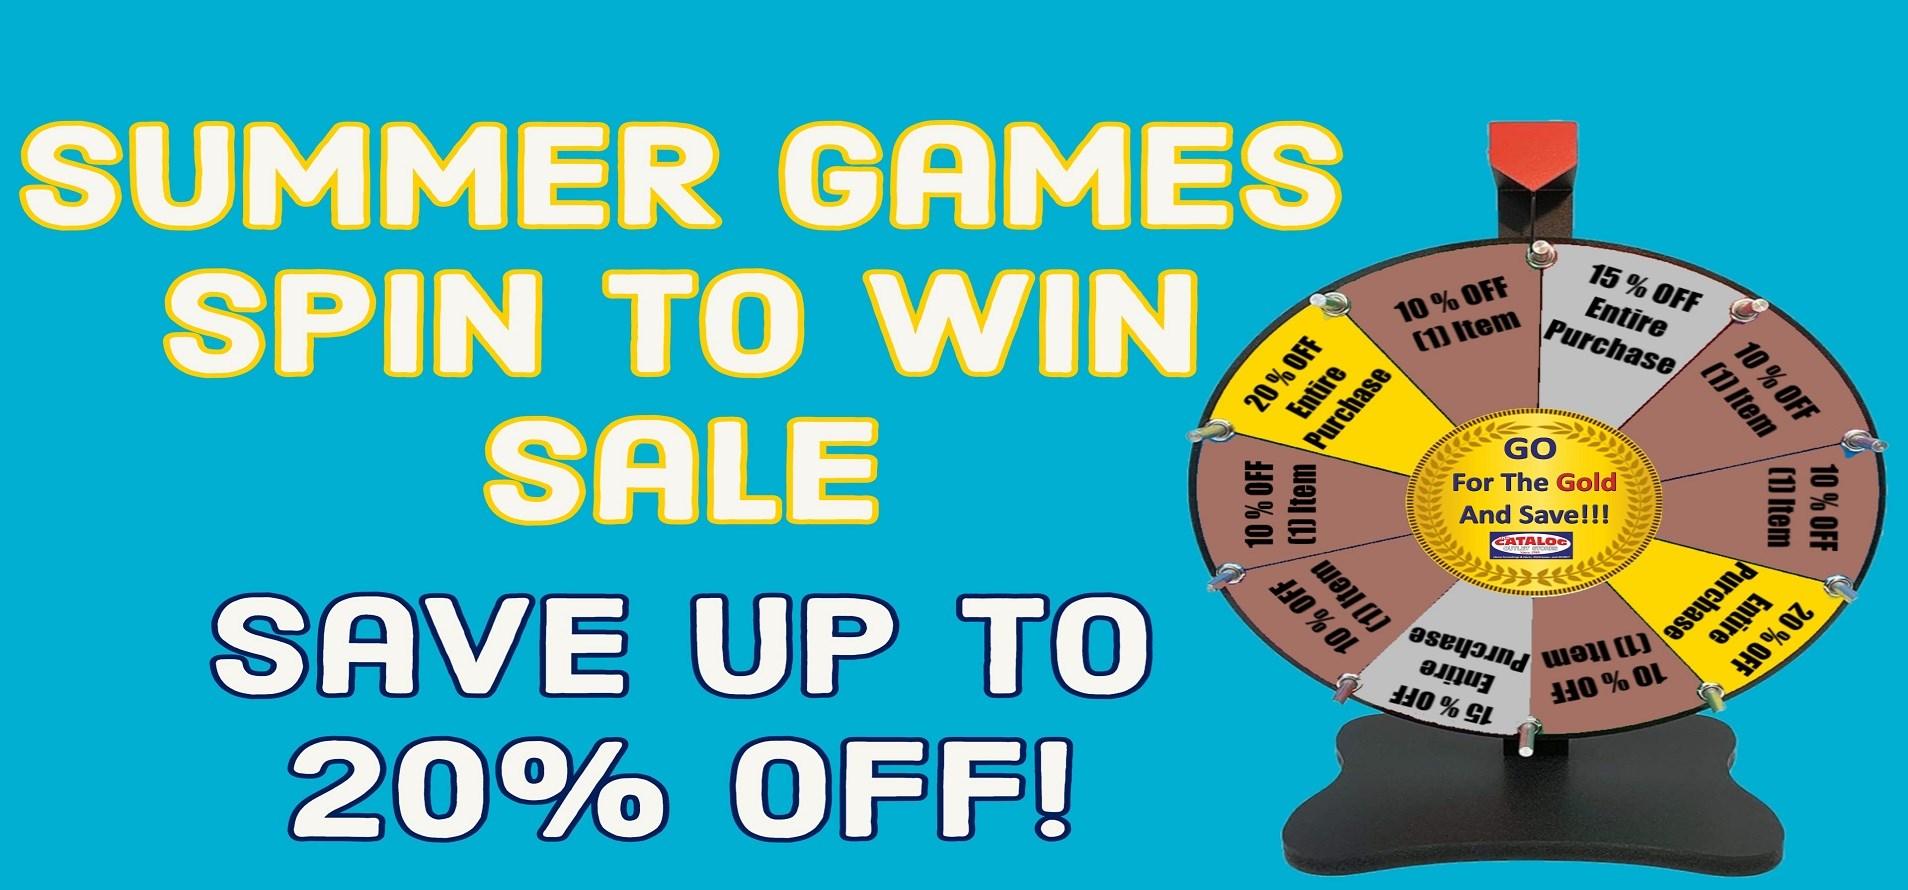 Summer Games Sale